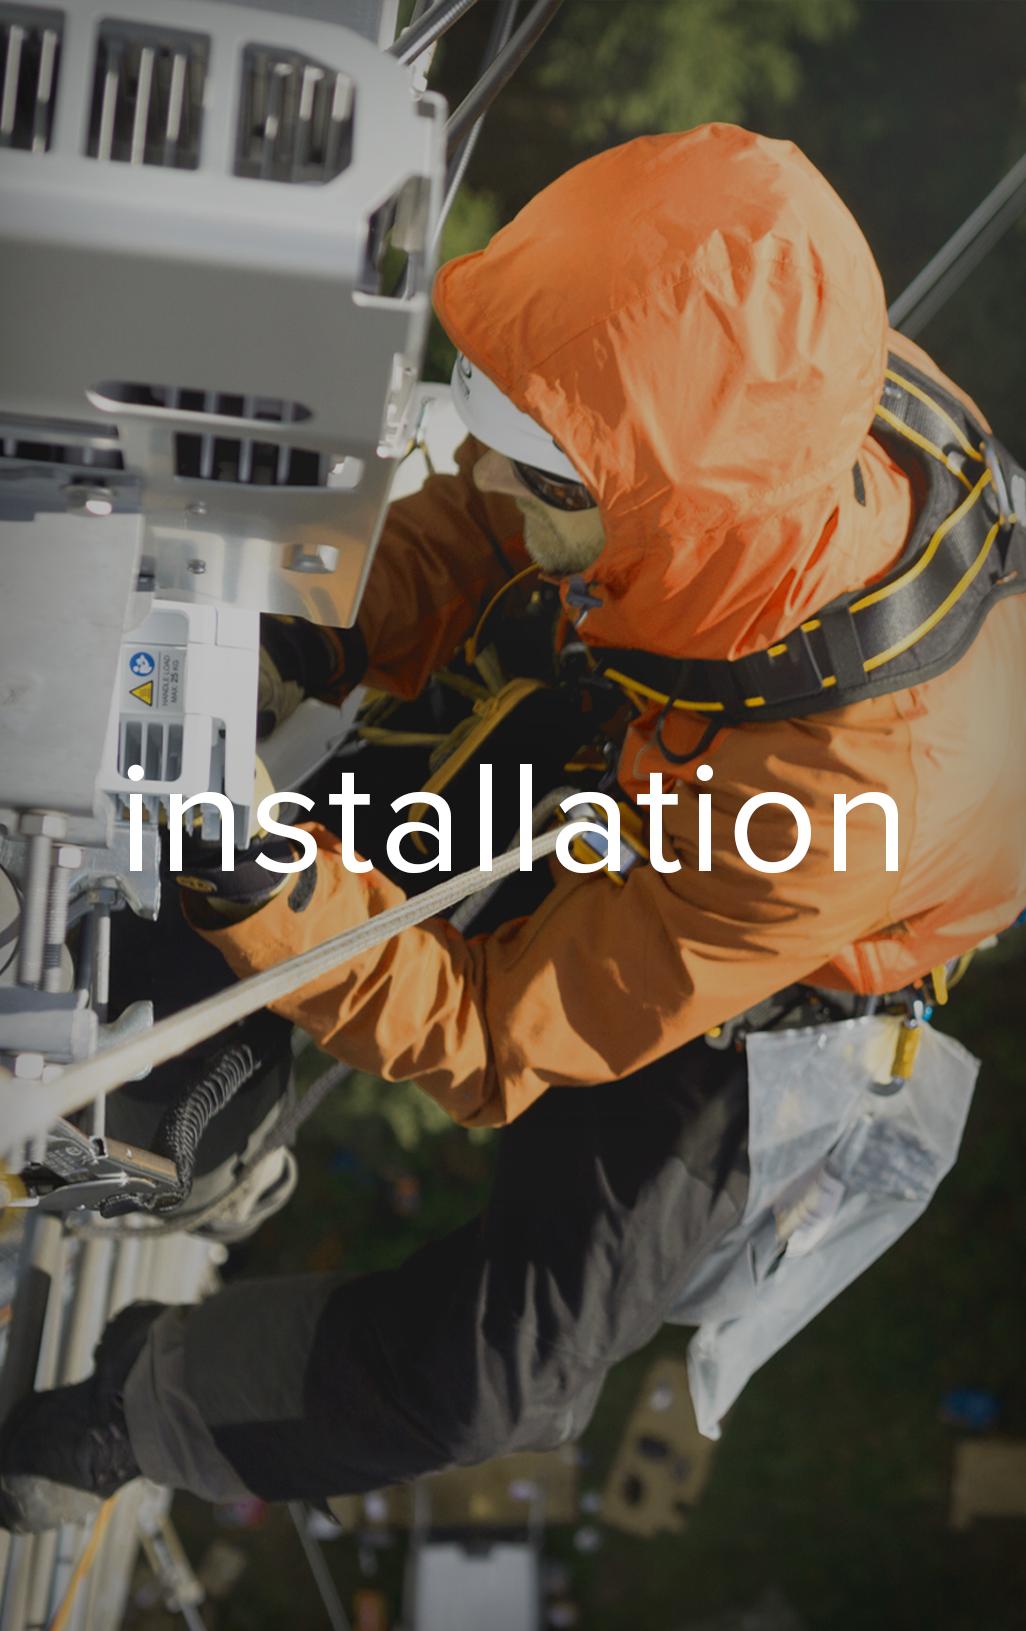 aztecs_installation_services.png